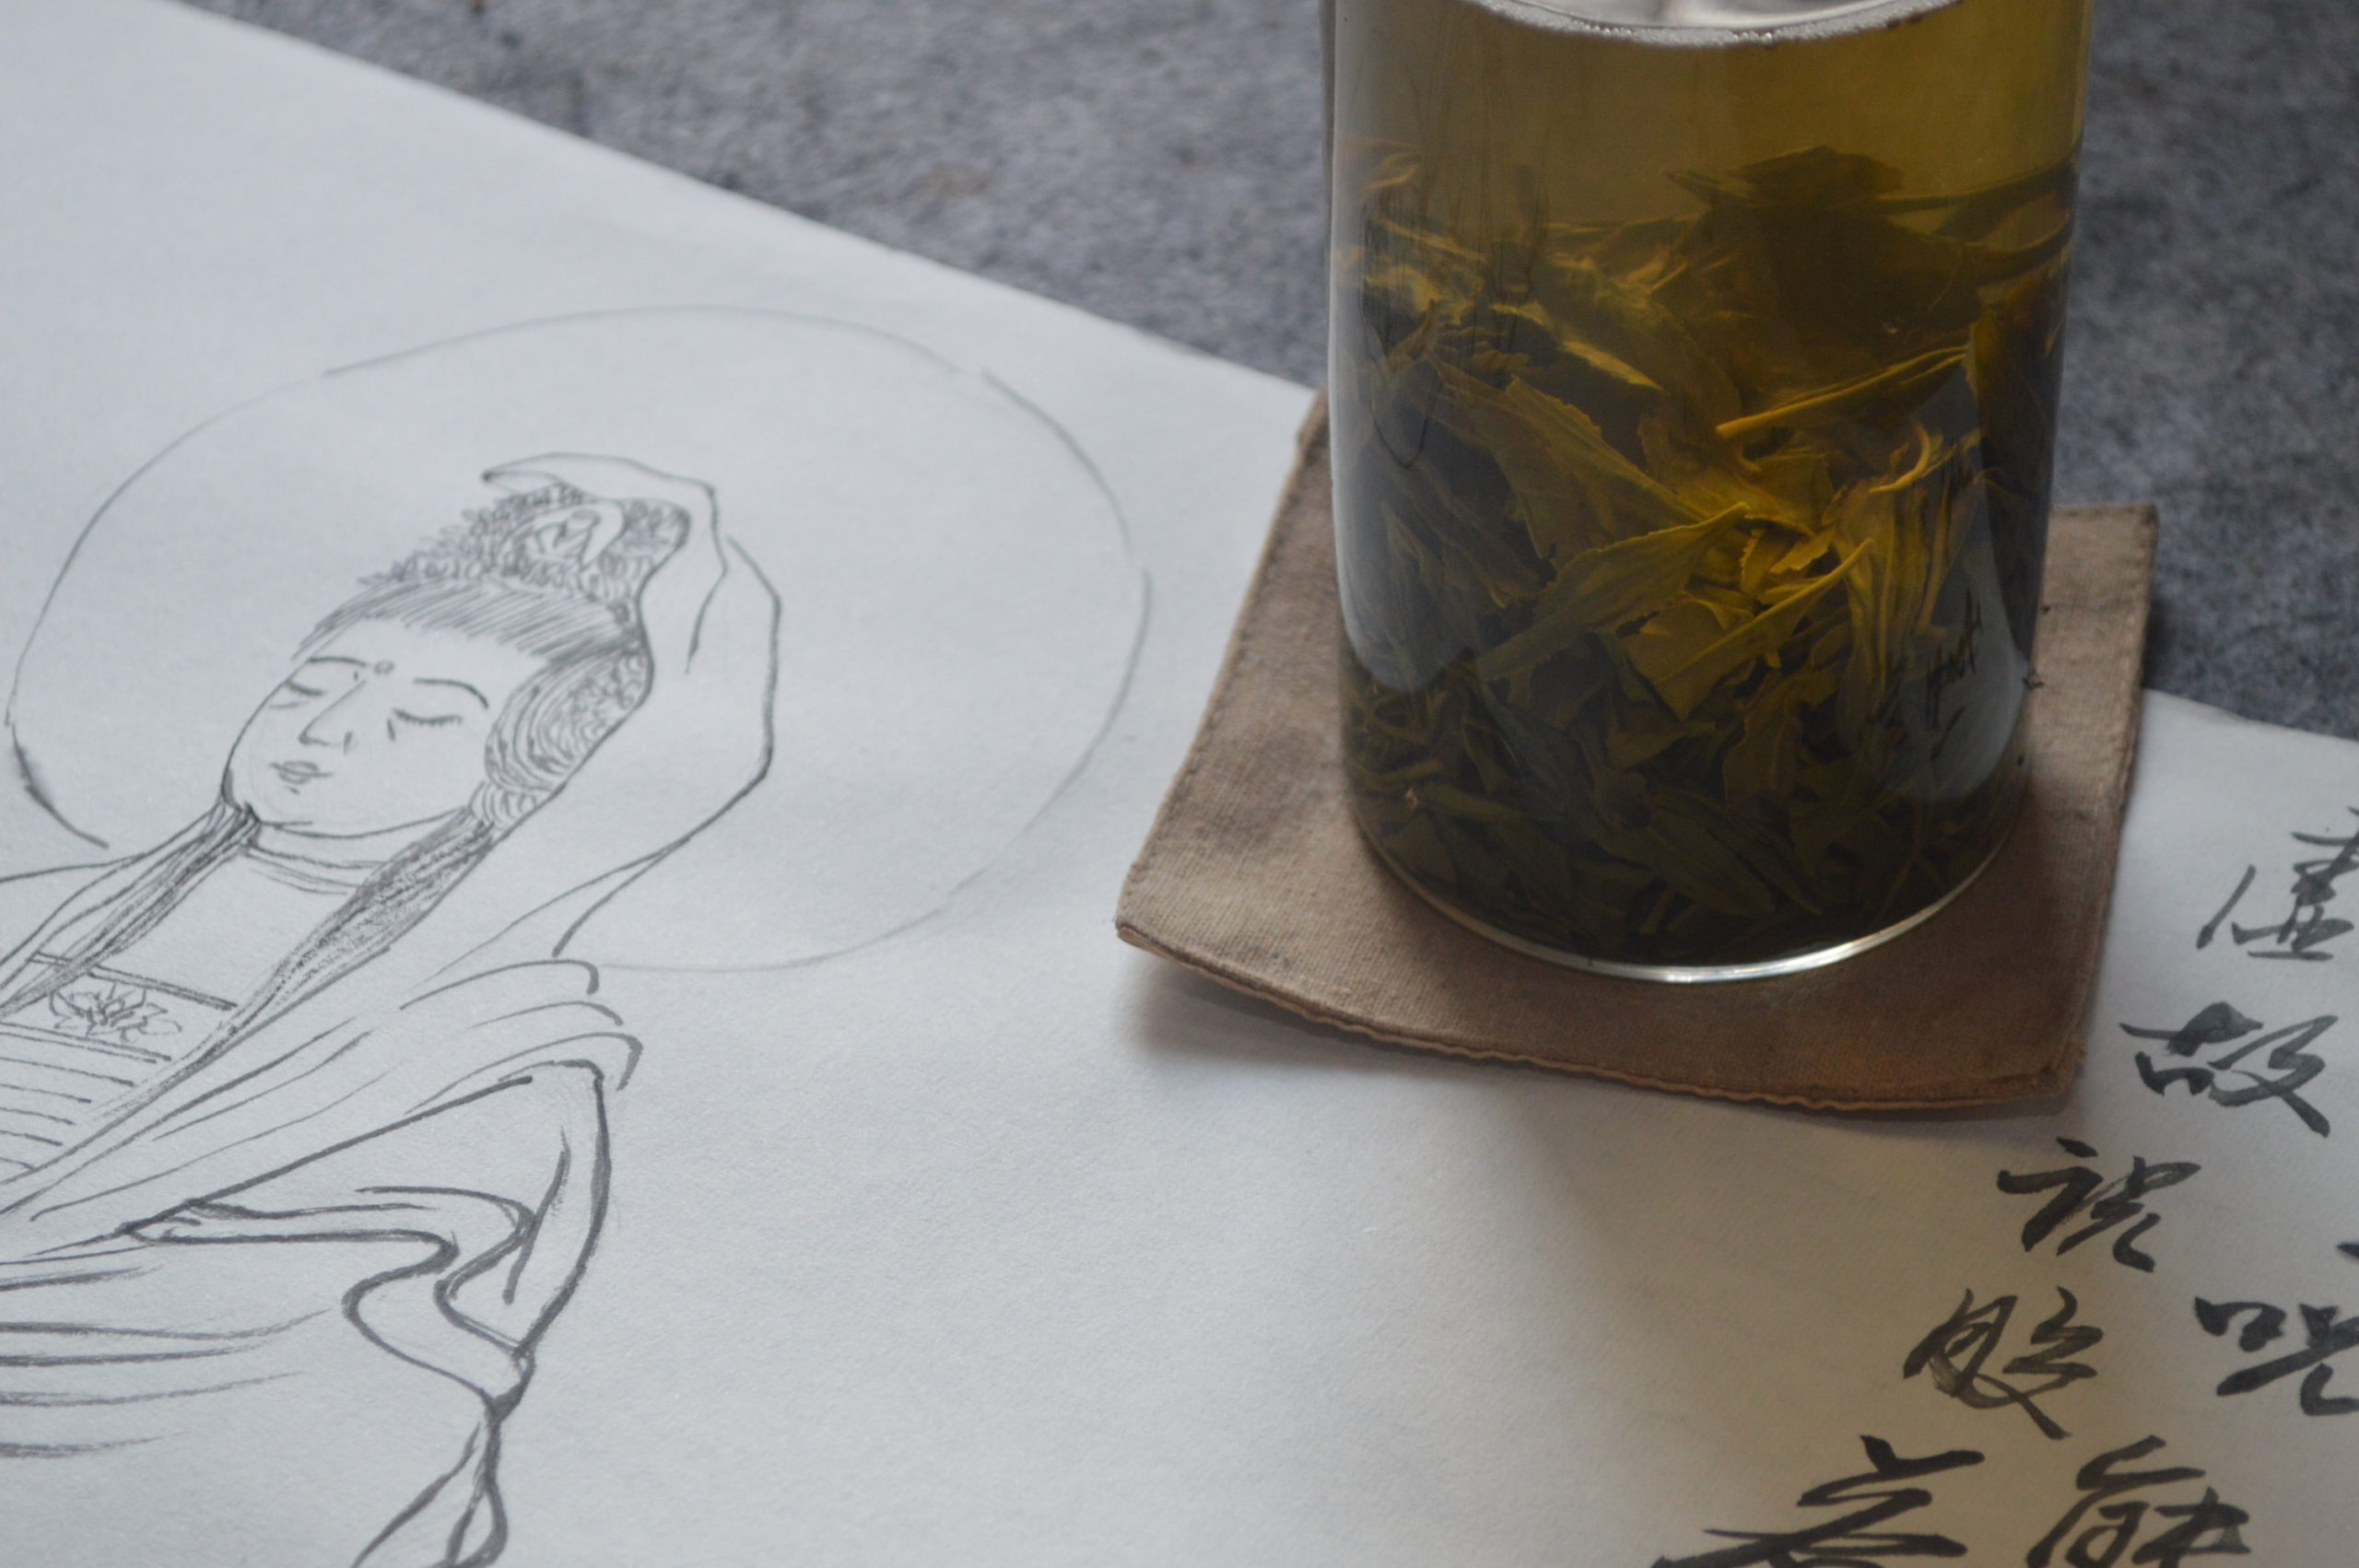 https://shop.liu-tea-art.com/wp-content/uploads/2020/08/DSC_0005-scaled.jpg